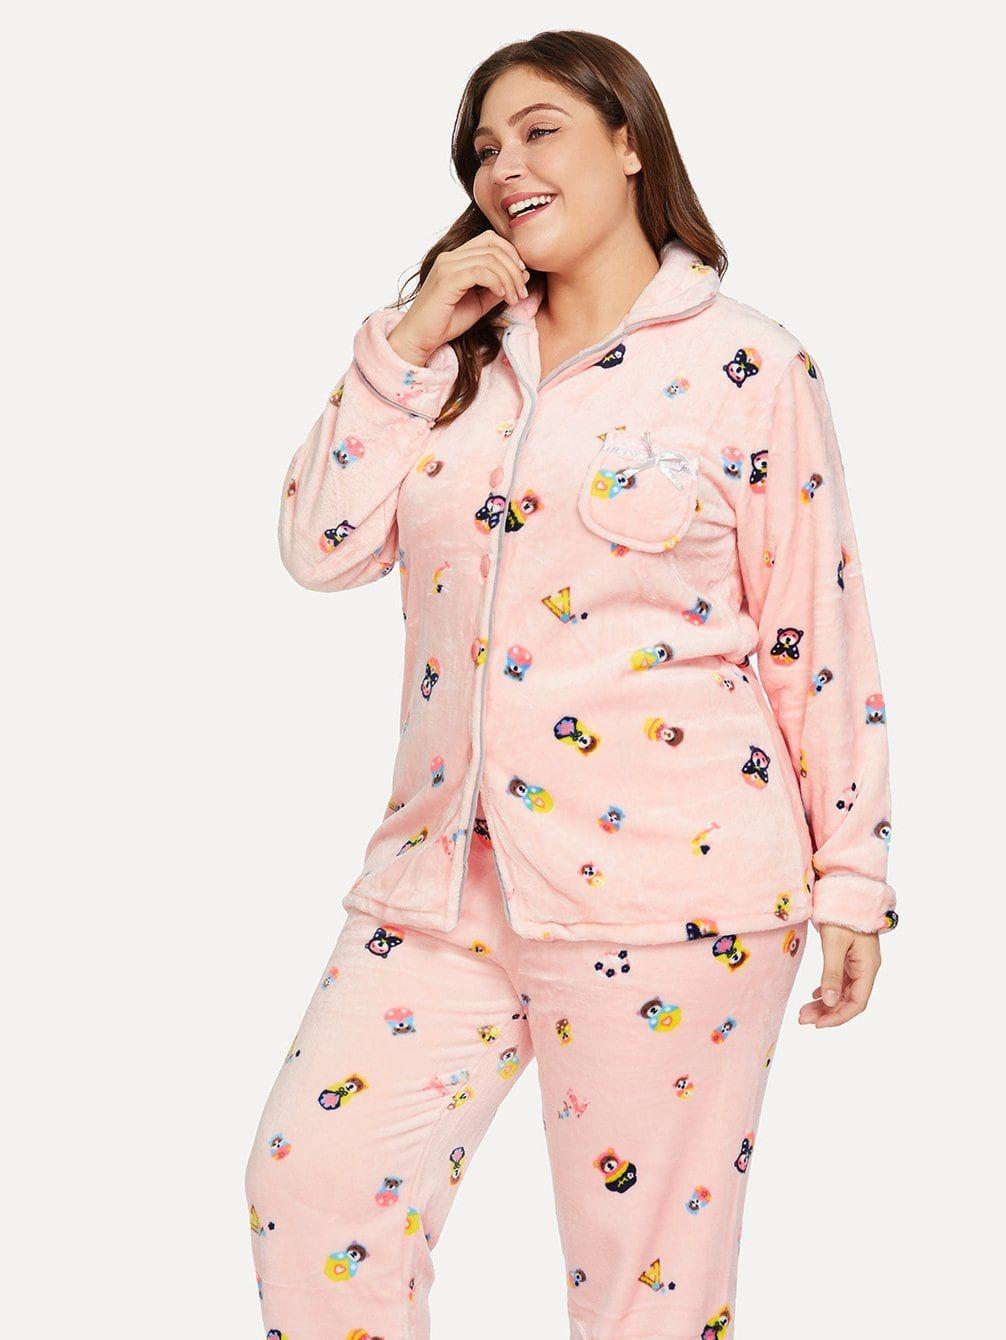 38dac37b9 Plus Cartoon Print Plush Pajama Set #jackets #trend #women #mode #woman  #girl #fashion